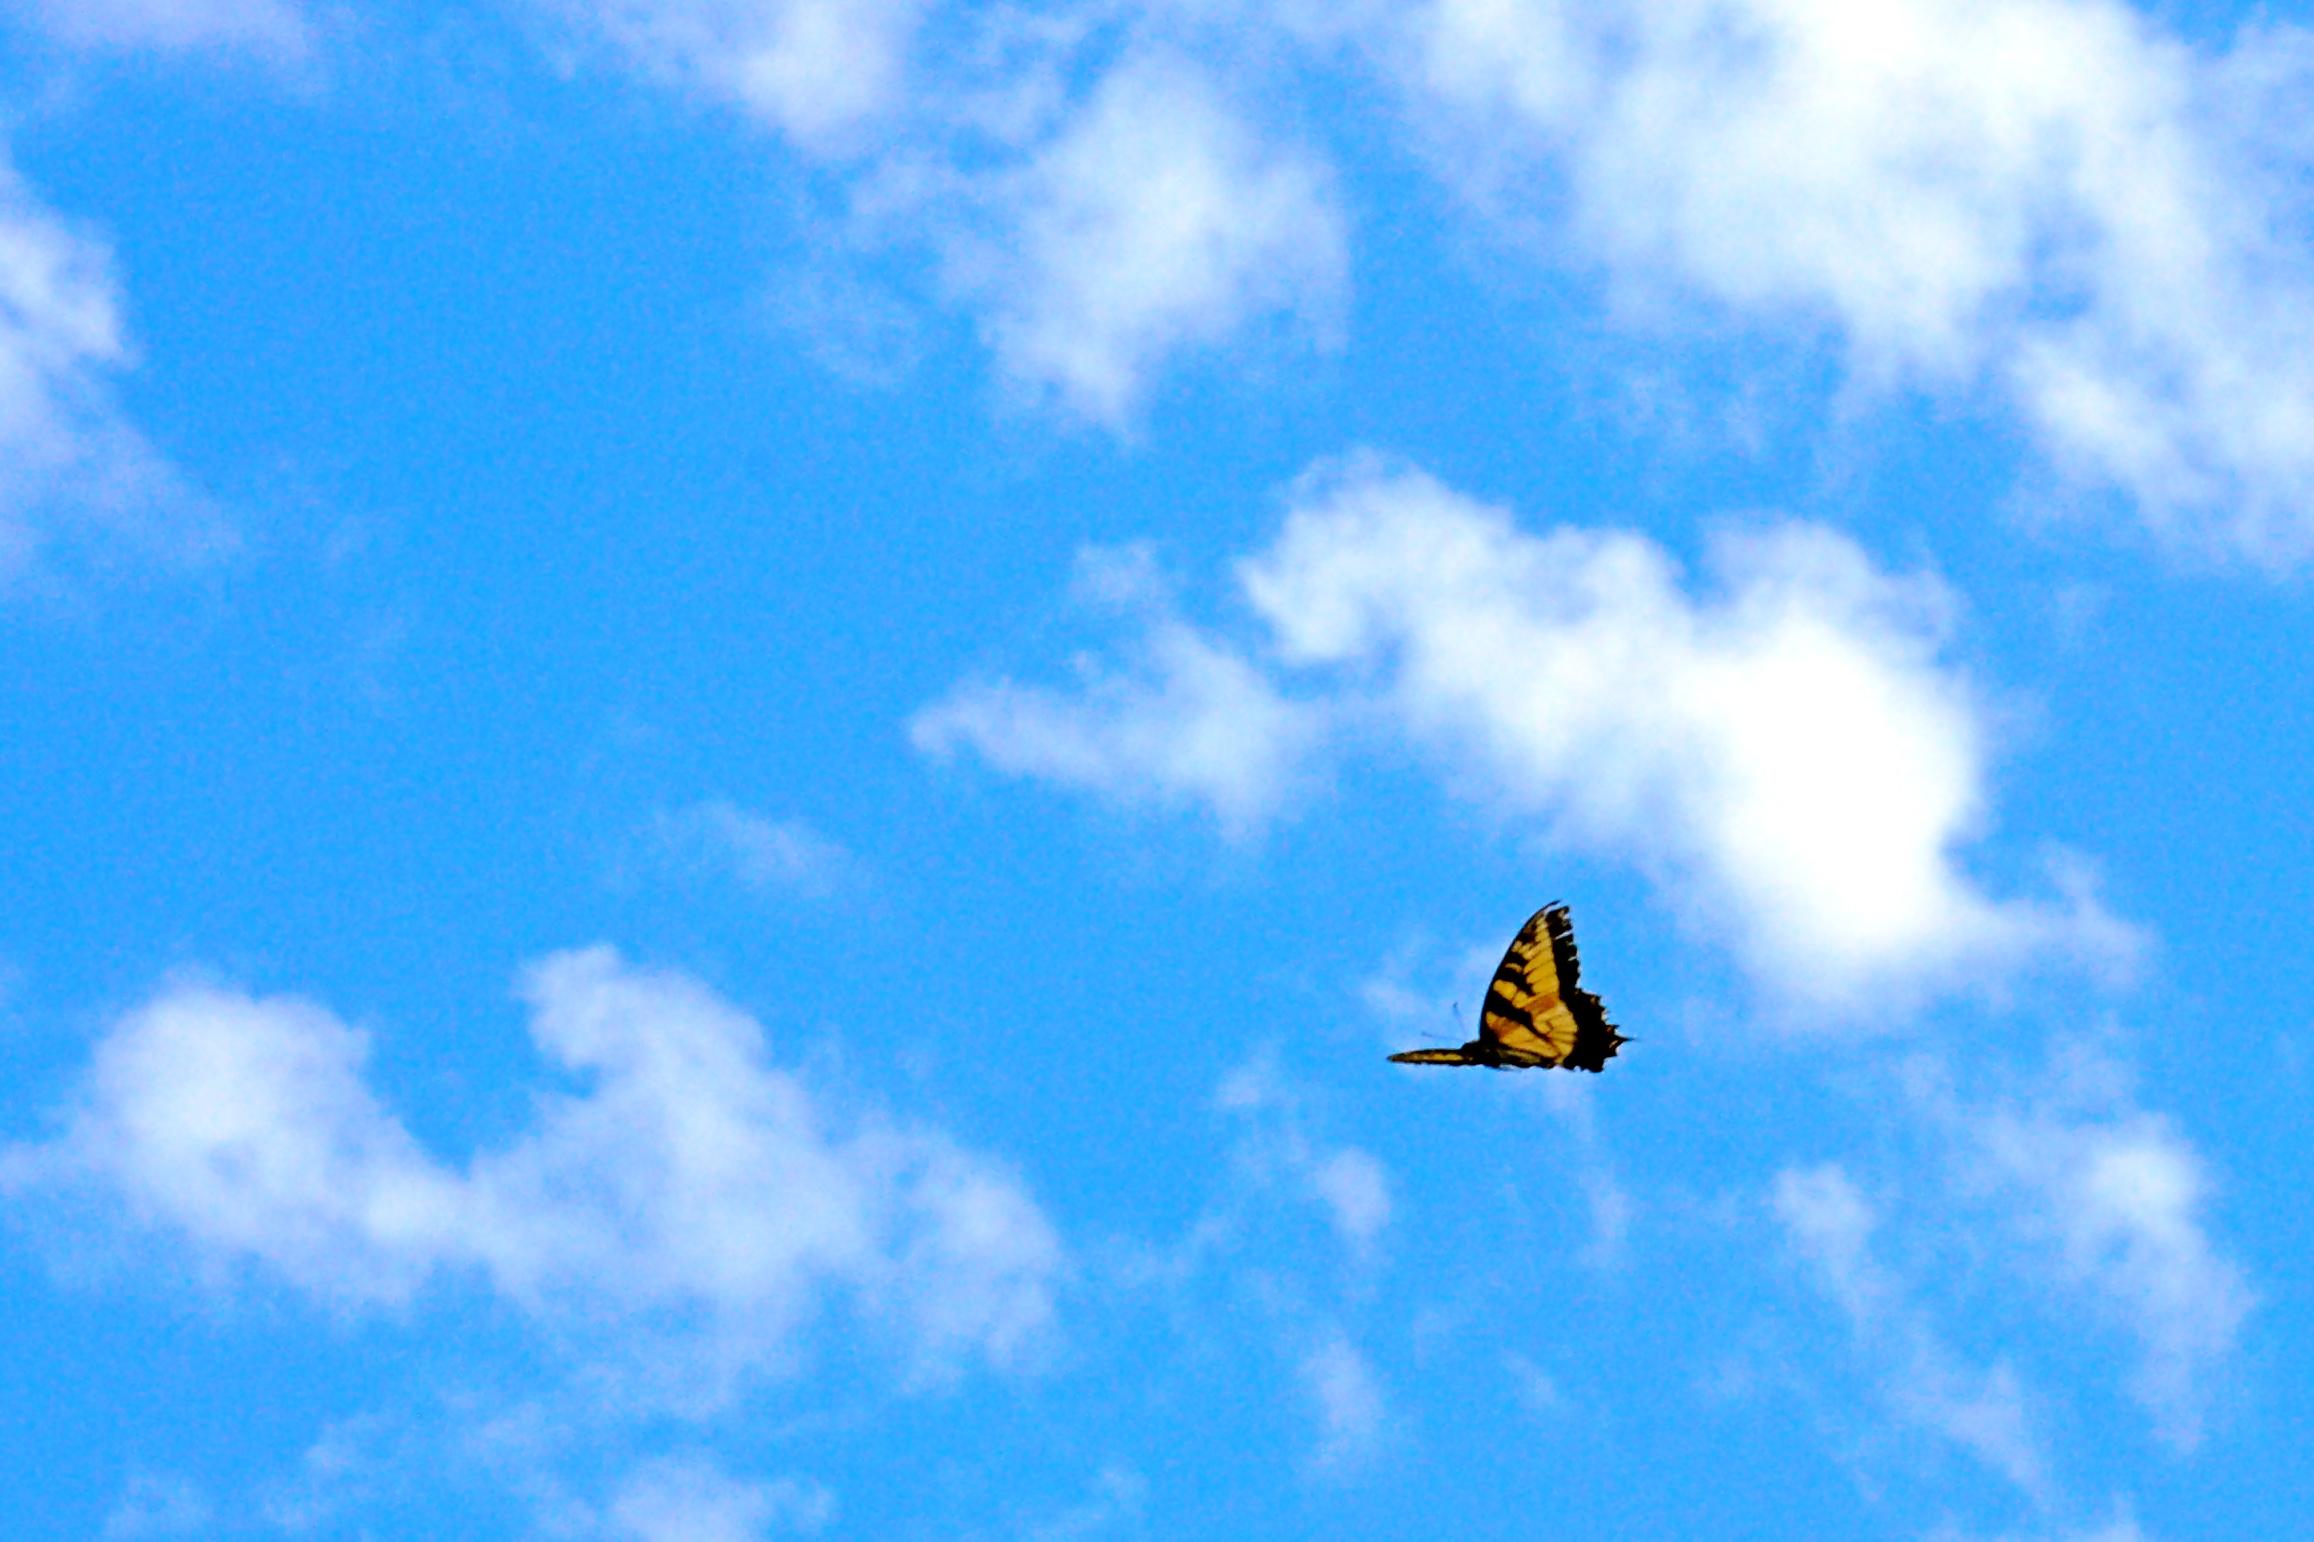 filethe other butterfly effect 2724591849jpg